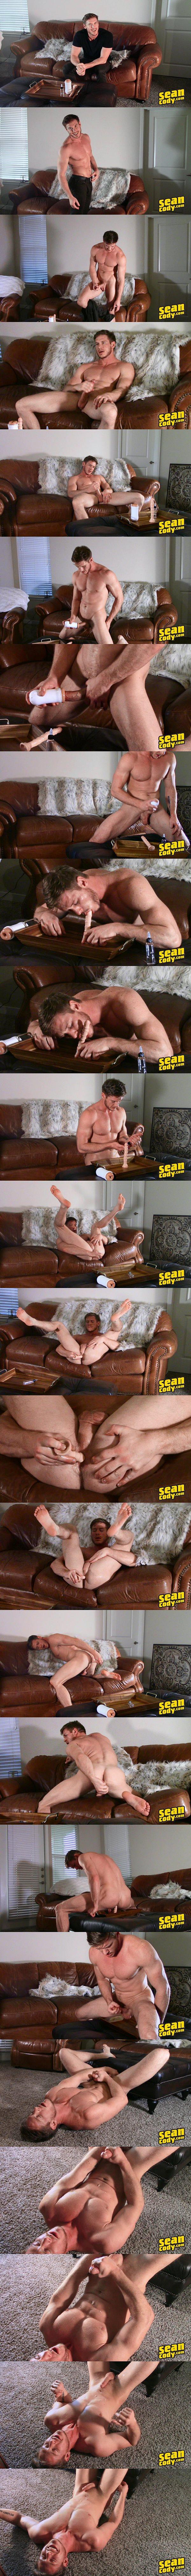 Handsome straight muscle jock Jax (aka Jordan Hayes) dildo fucks his tight virgin hole until he shoots his white jizz in a homemade solo at Seancody 01